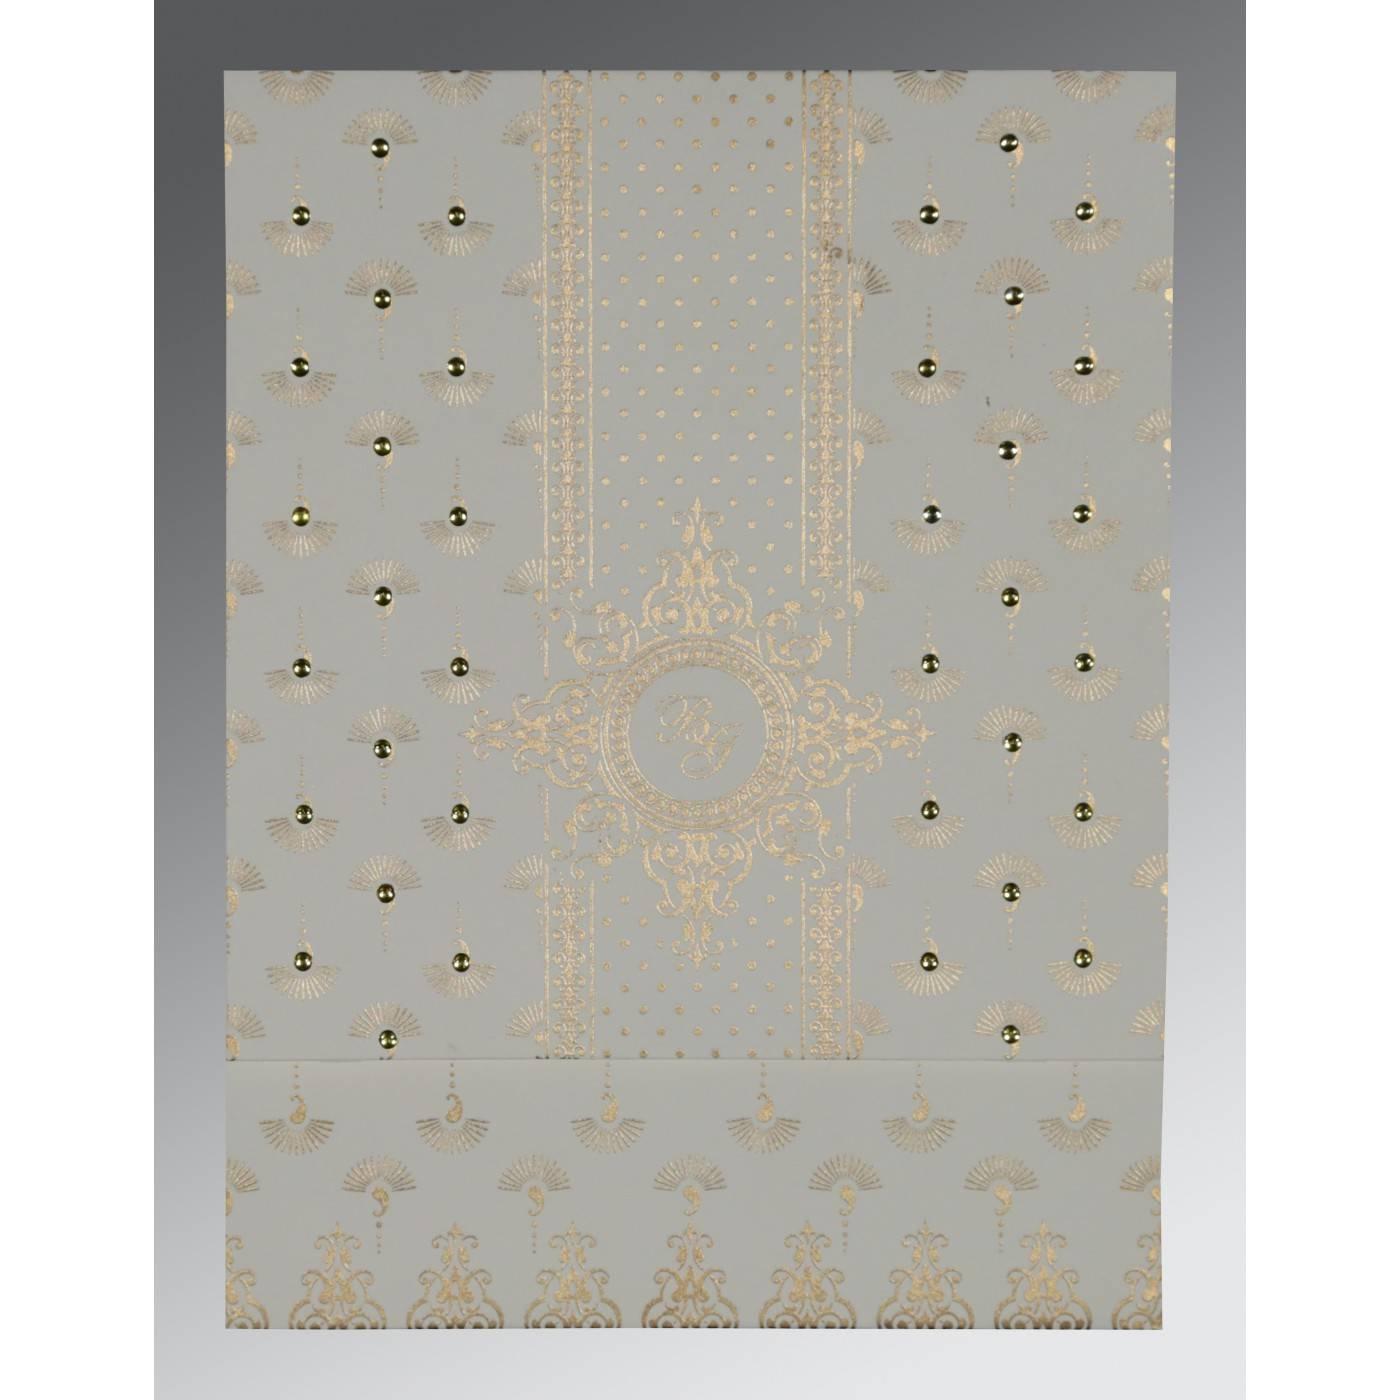 OFF-WHITE MATTE SCREEN PRINTED WEDDING INVITATION : CG-8247M - IndianWeddingCards